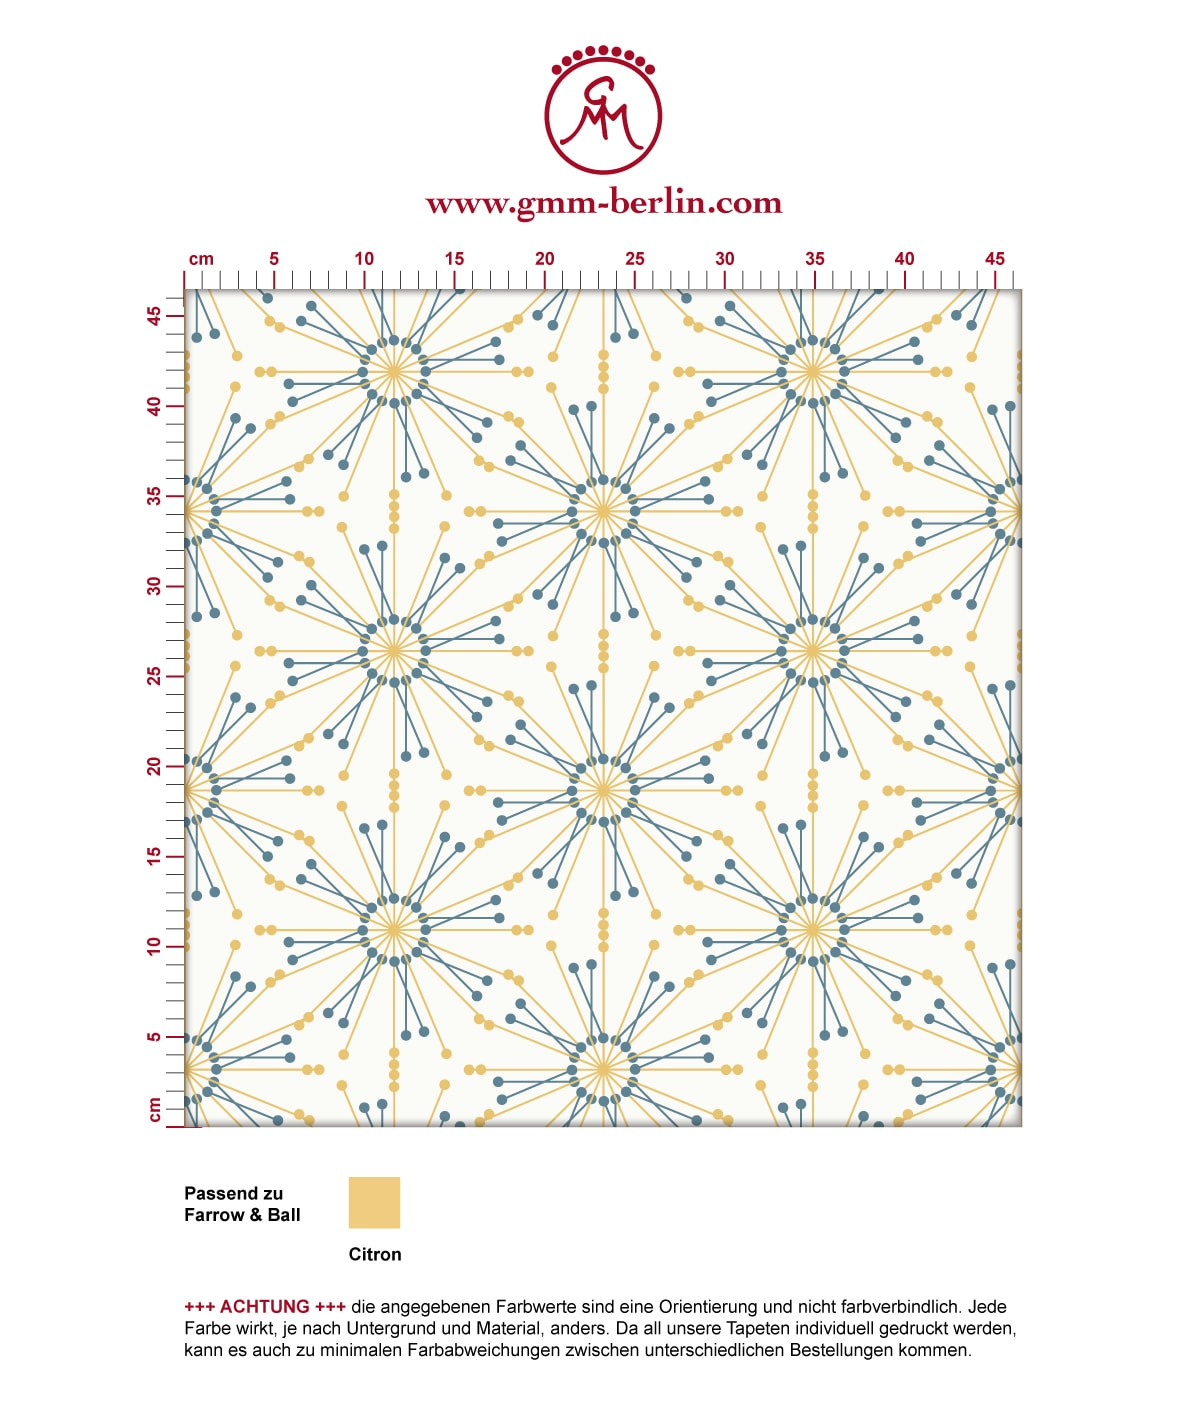 "Leichte Tapete ""Sonnenstern"" in gelb angepasst an Farrow and Ball Wandfarben 3"